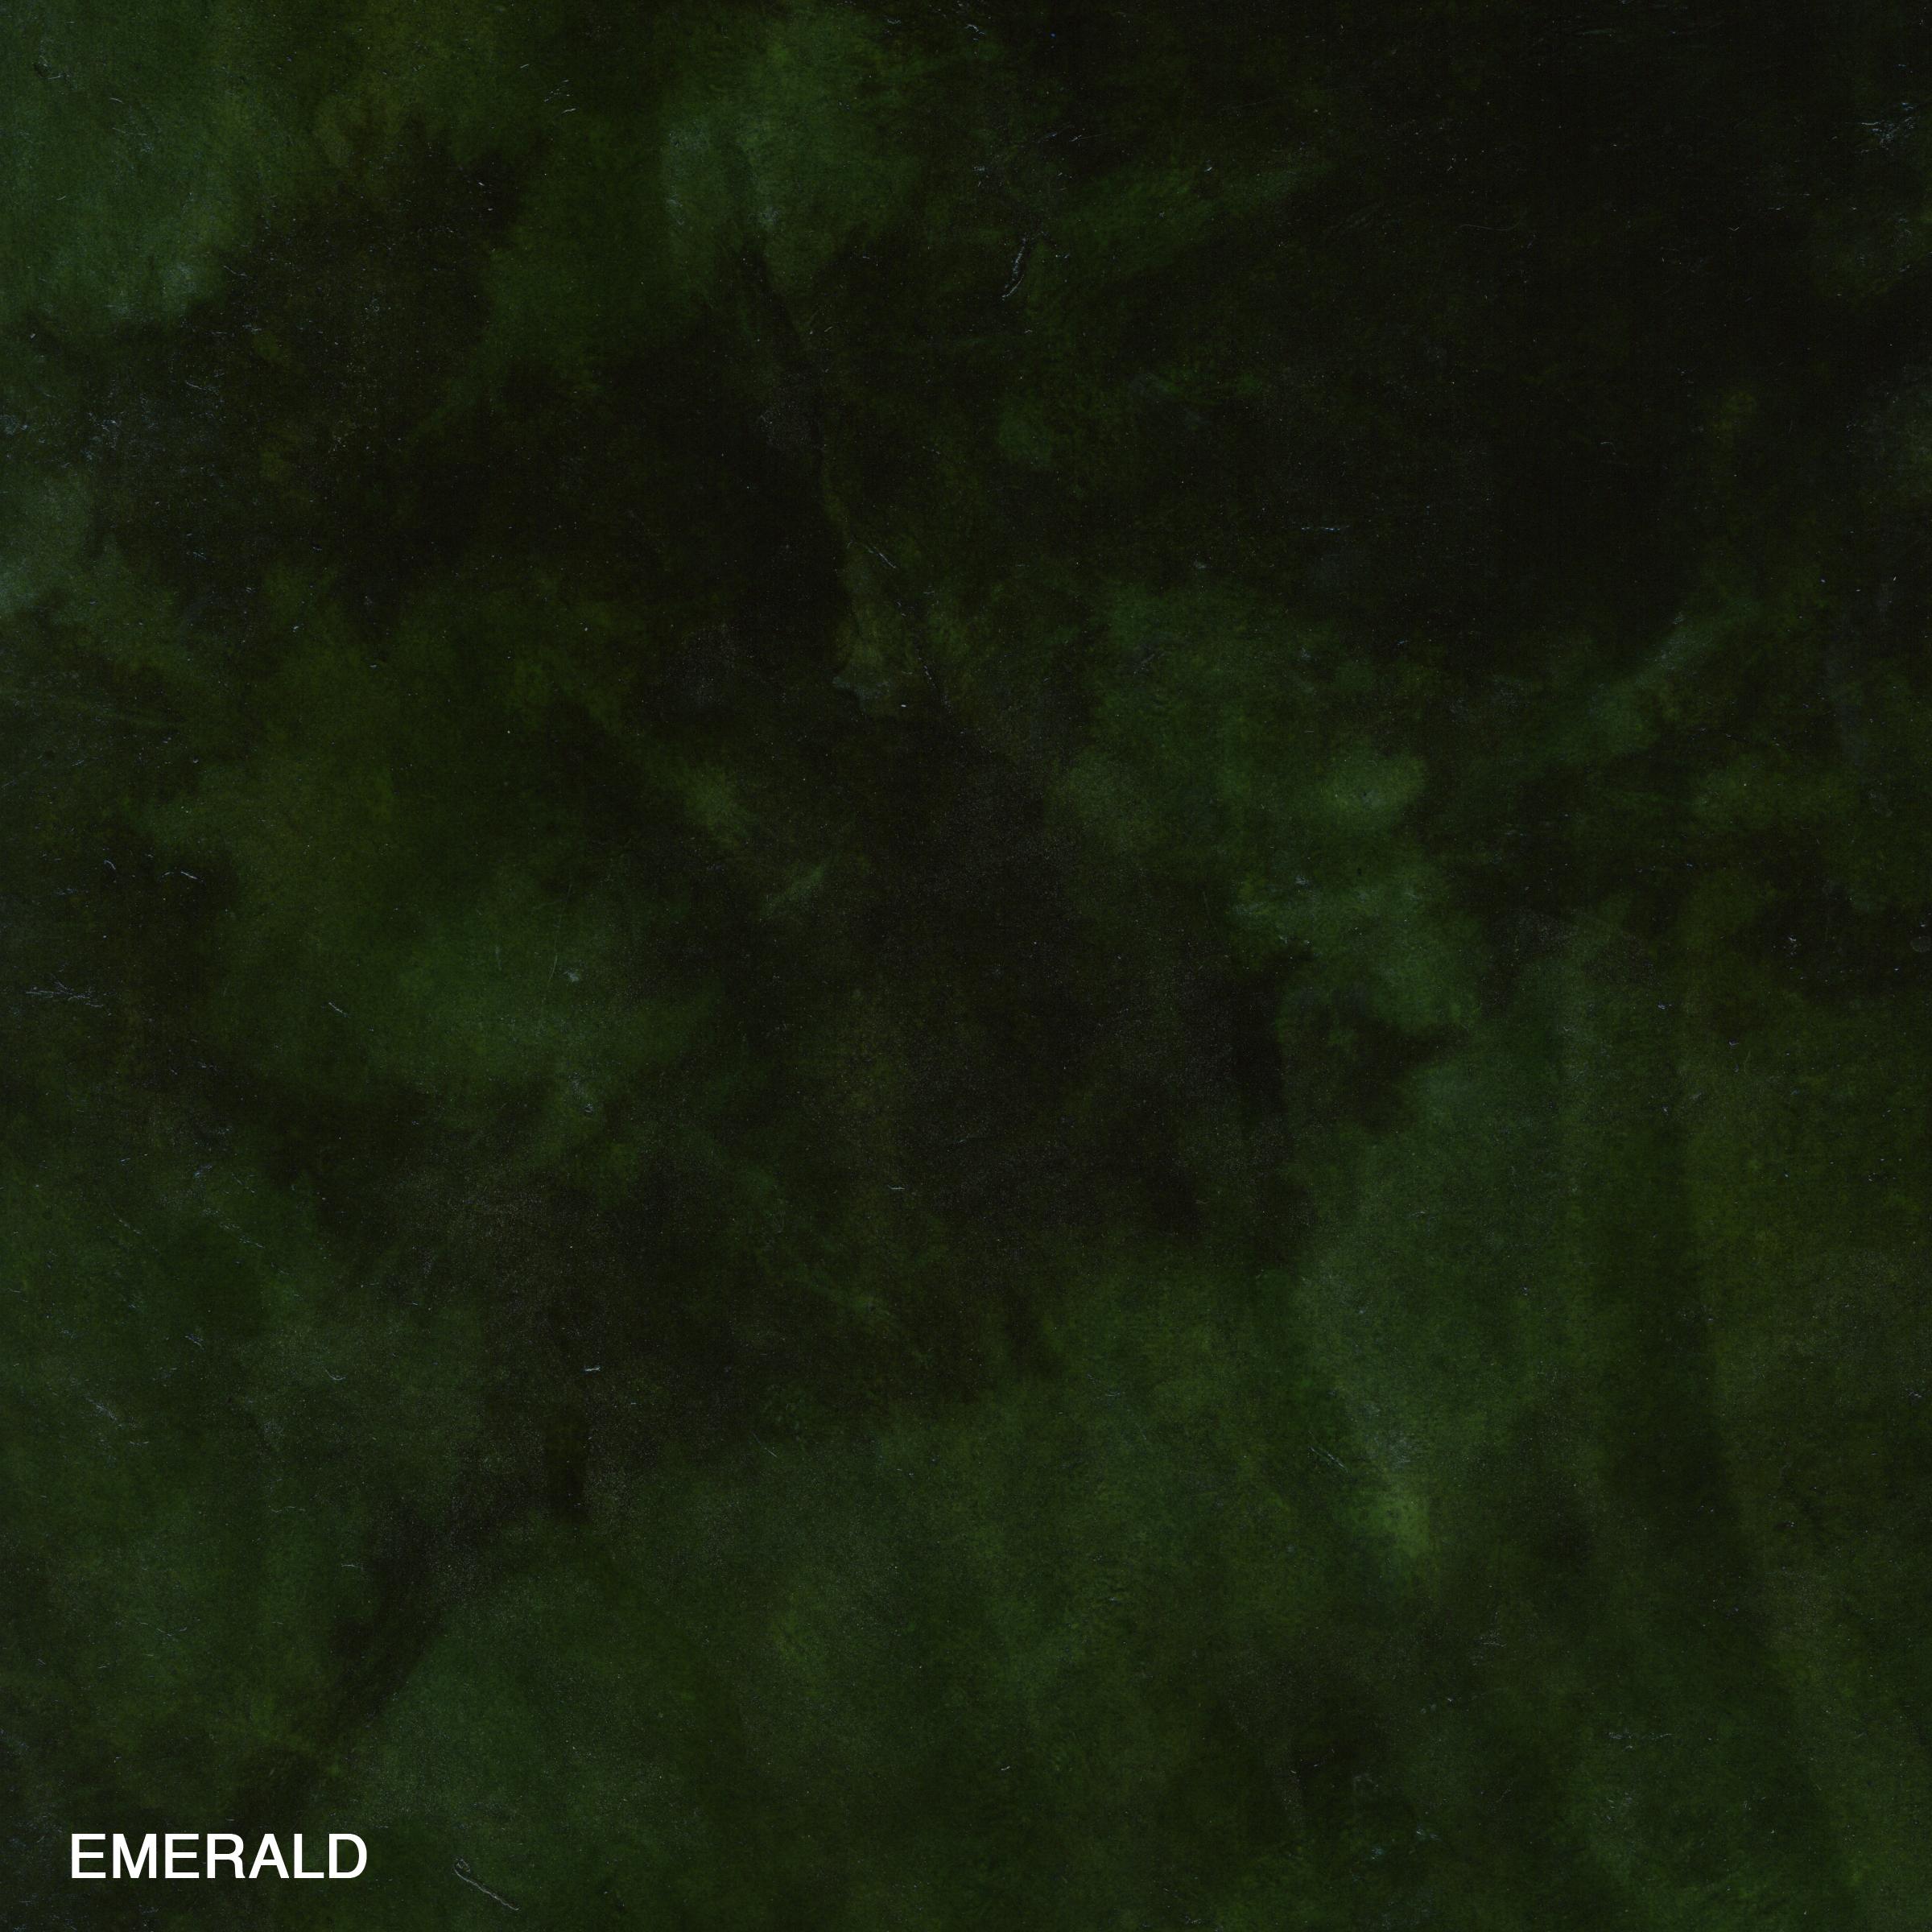 EMERALD009.jpg